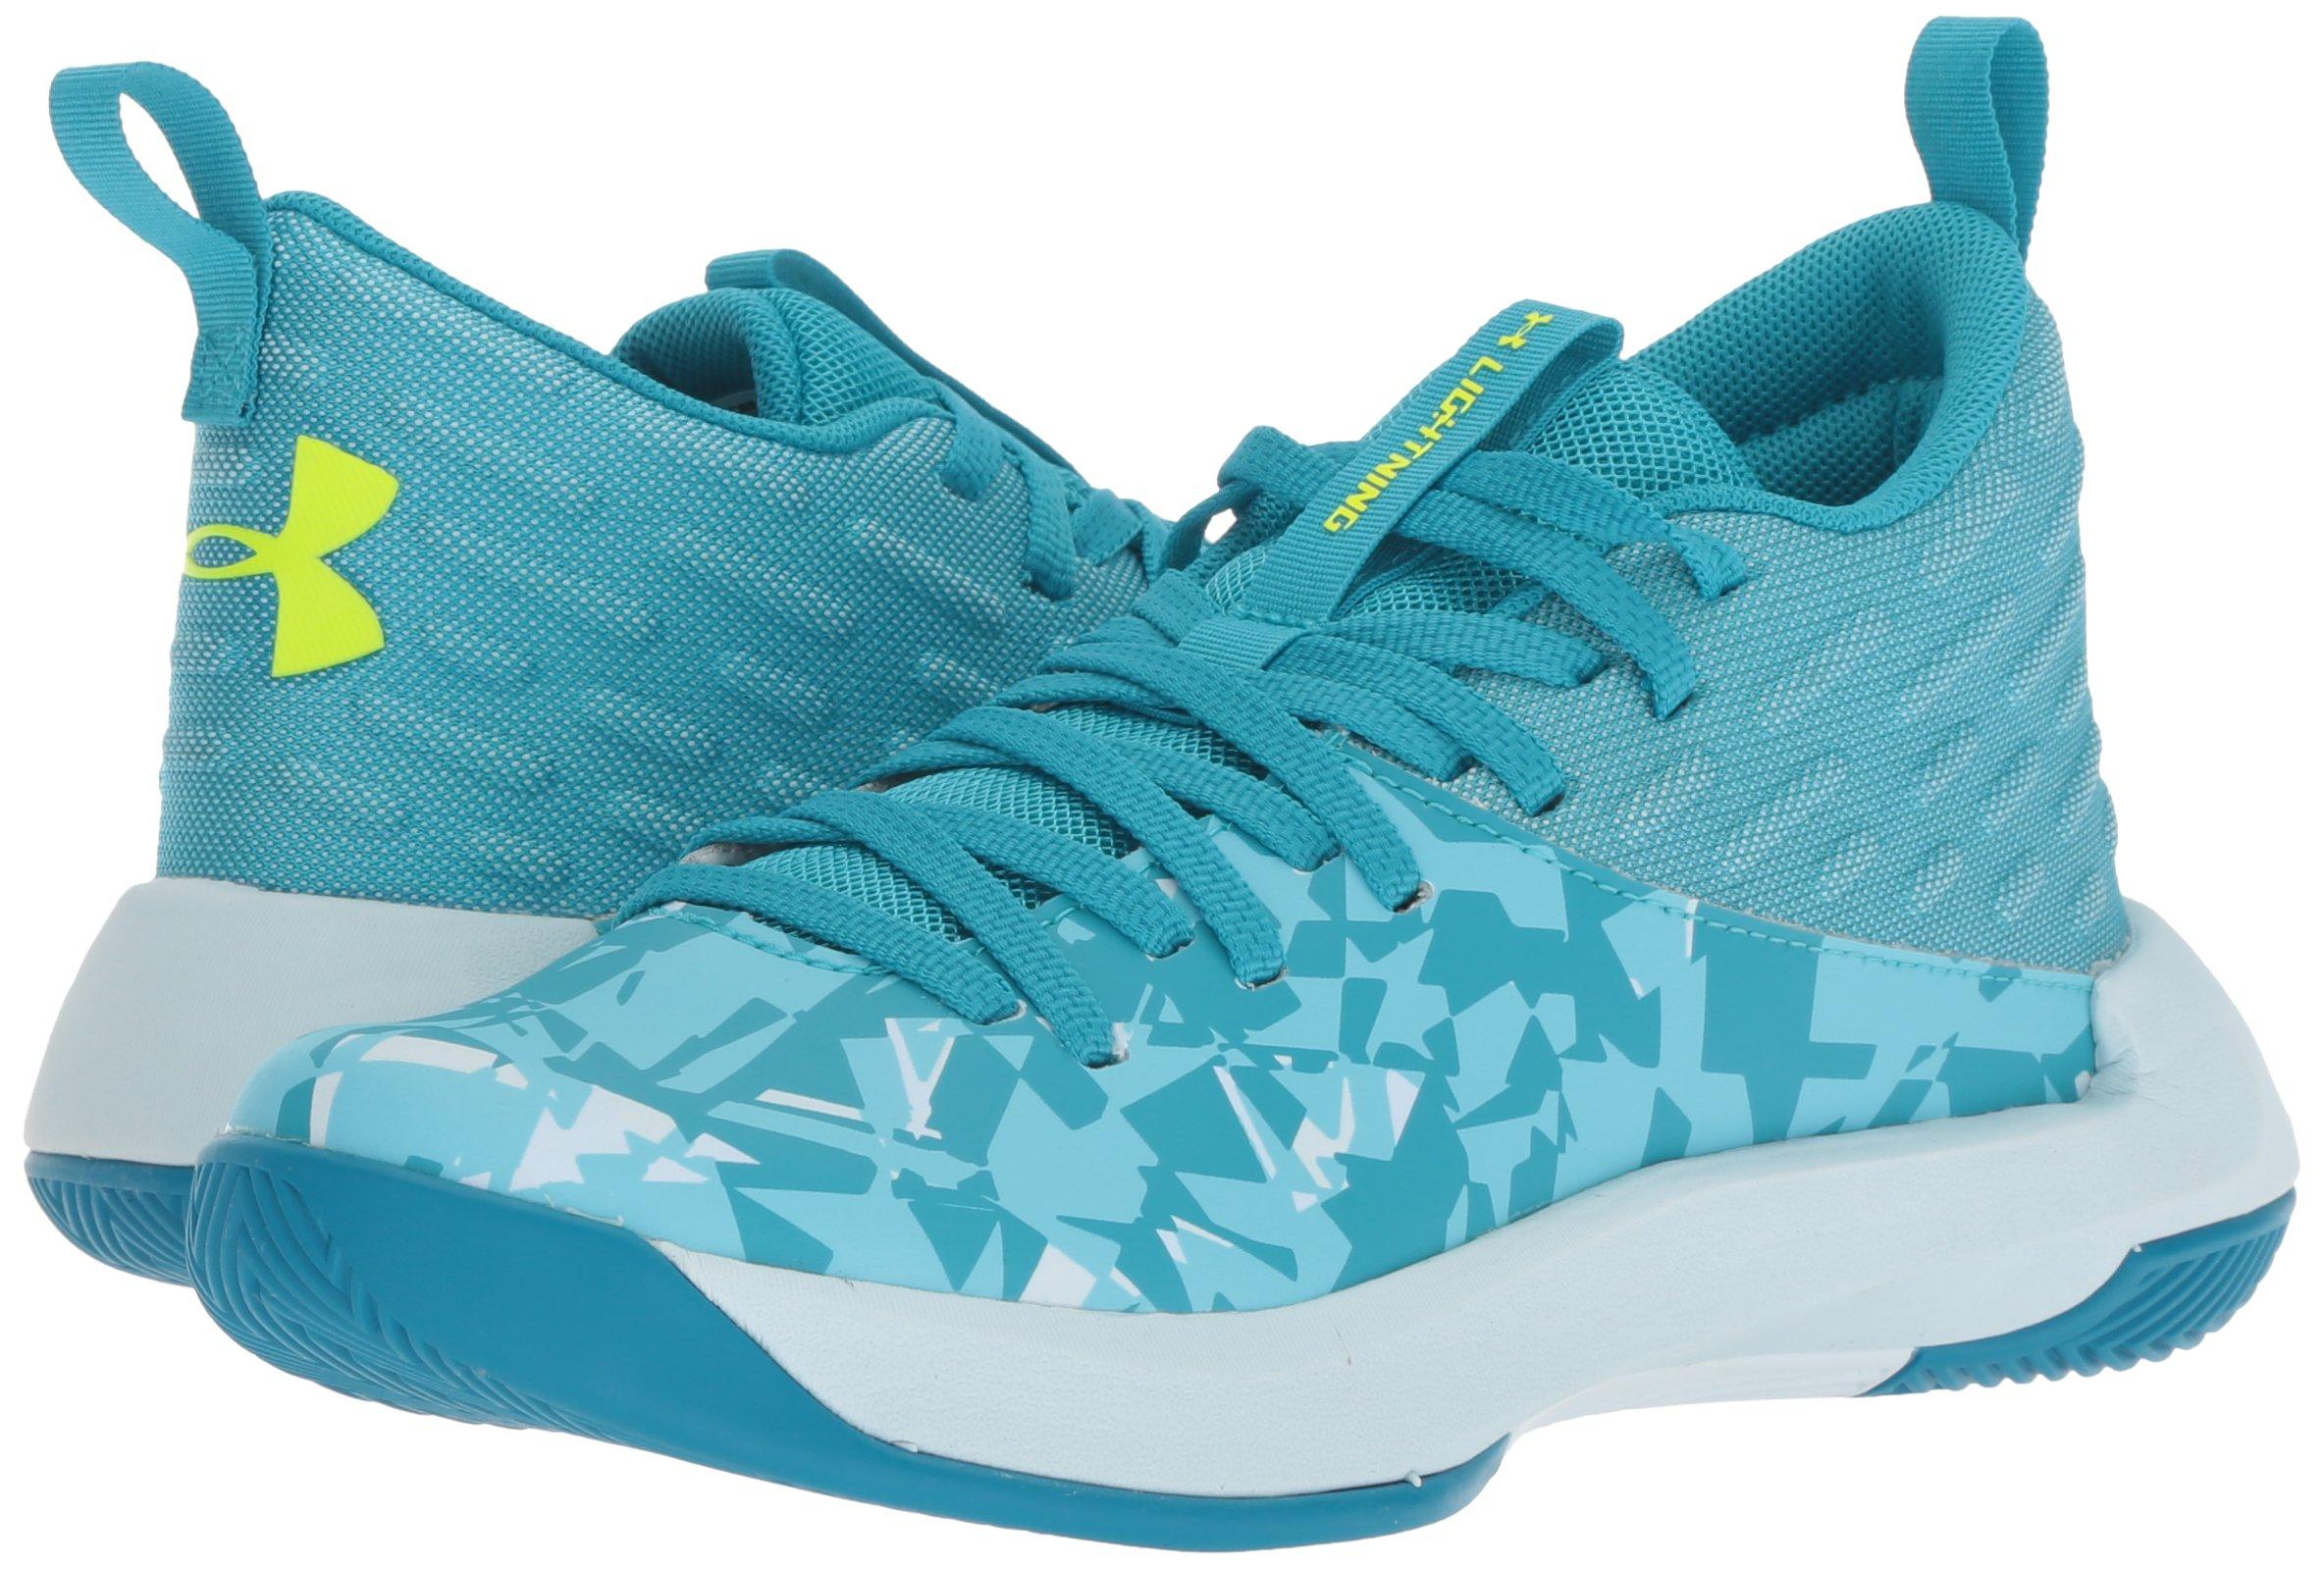 Under Armour Girls' Grade School Lightning 5 Basketball Shoe, Deceit (300)/Halogen Blue, 5.5 by Under Armour (Image #5)